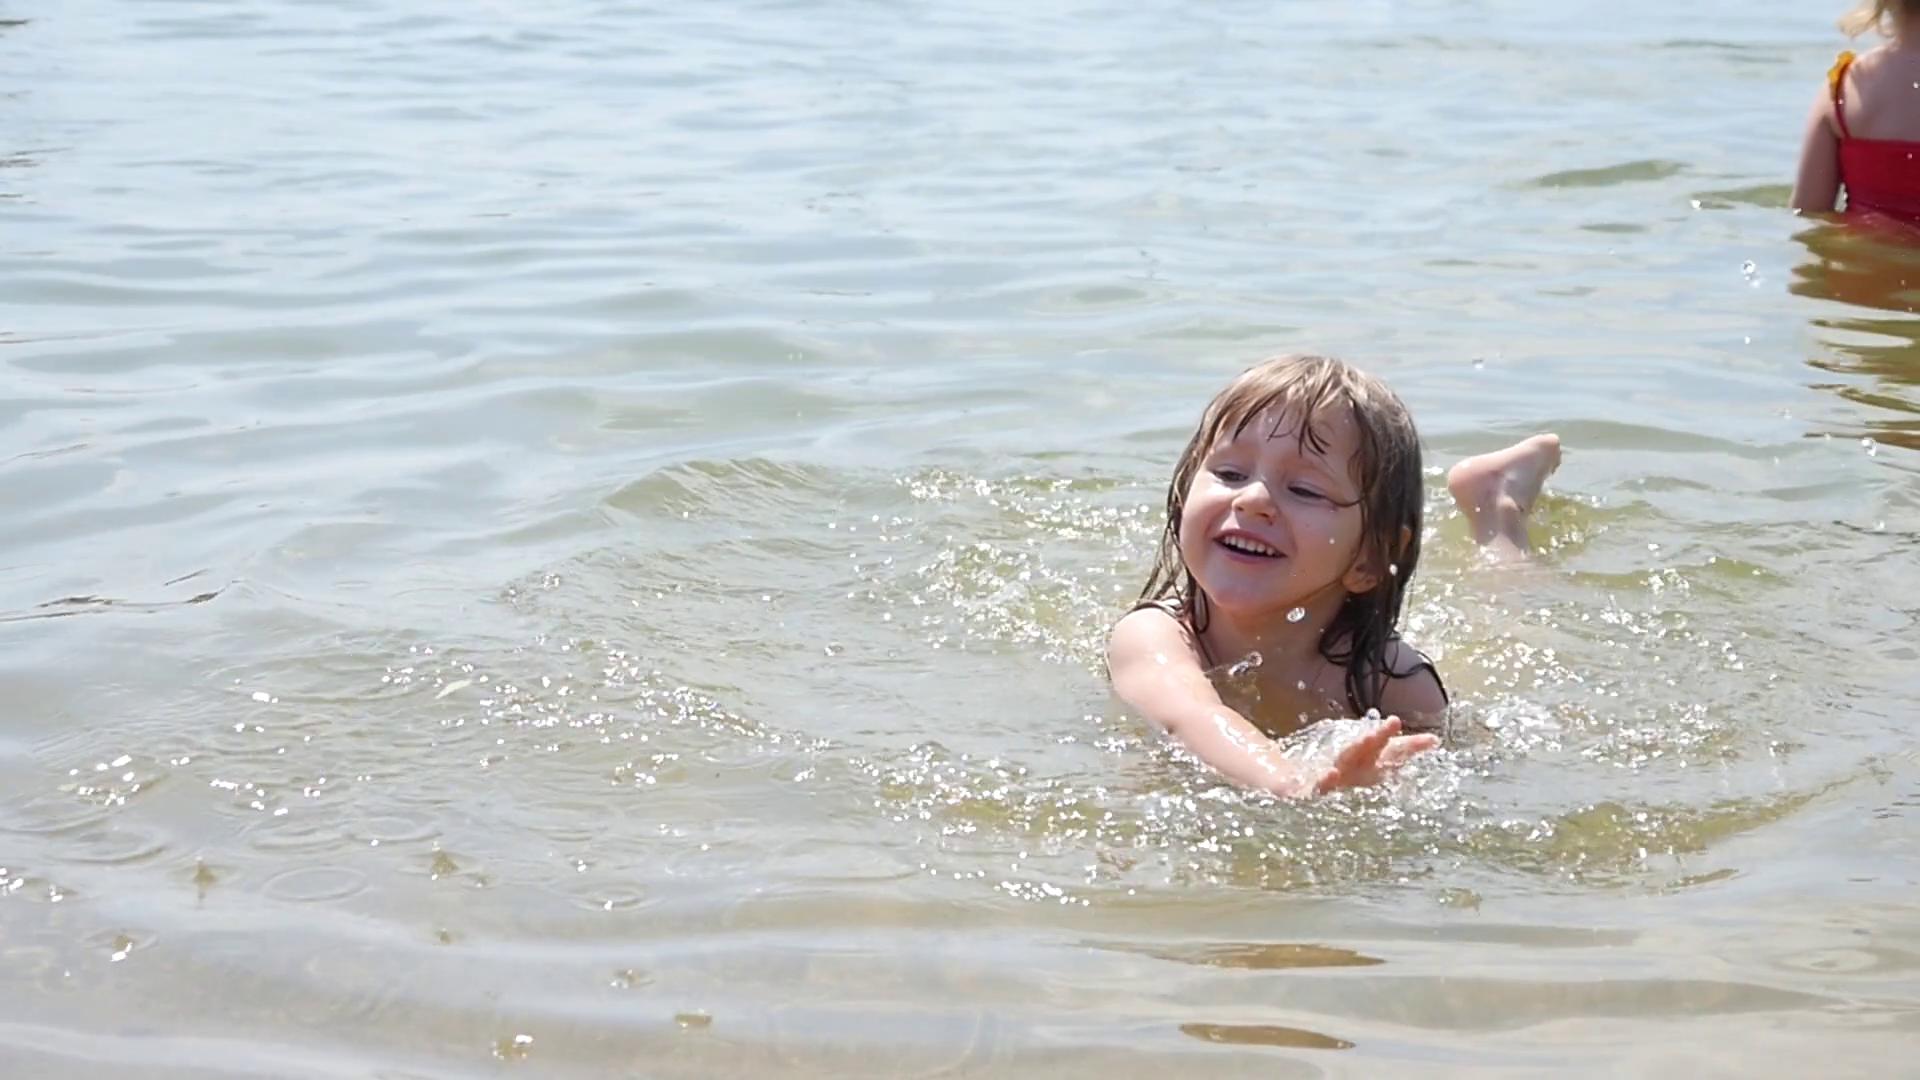 Little Girl Swimming In Lake Stock Image - Image of aqua